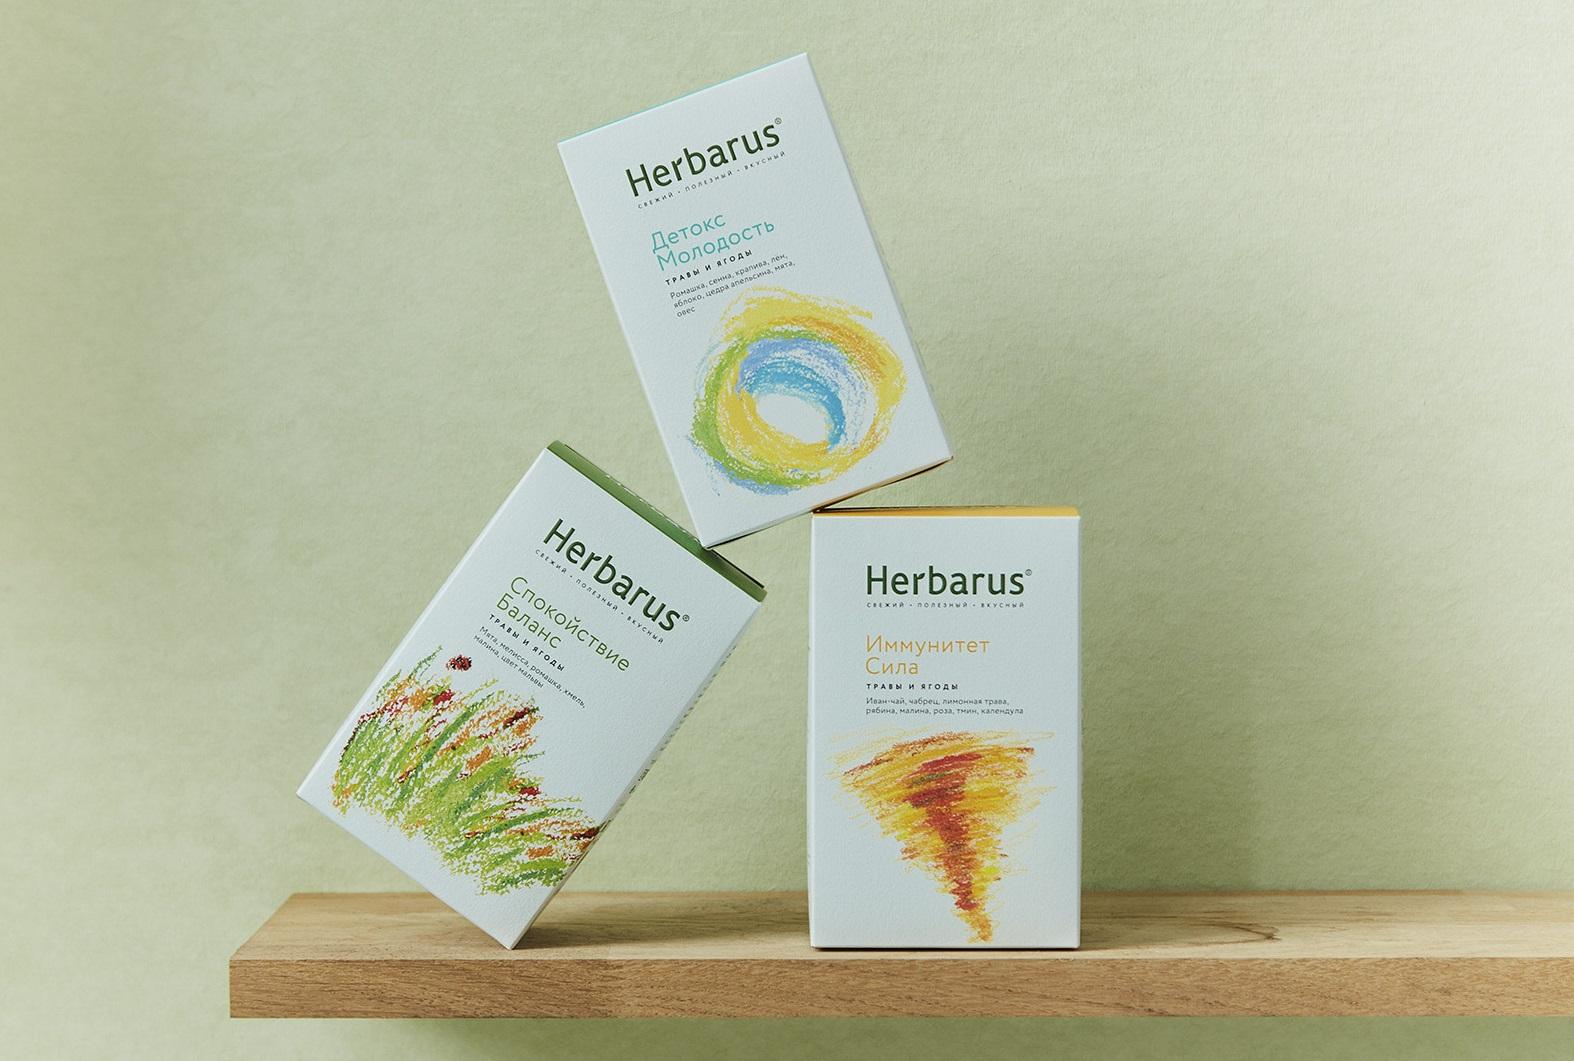 Польза природы: травяные чаи Herbarus